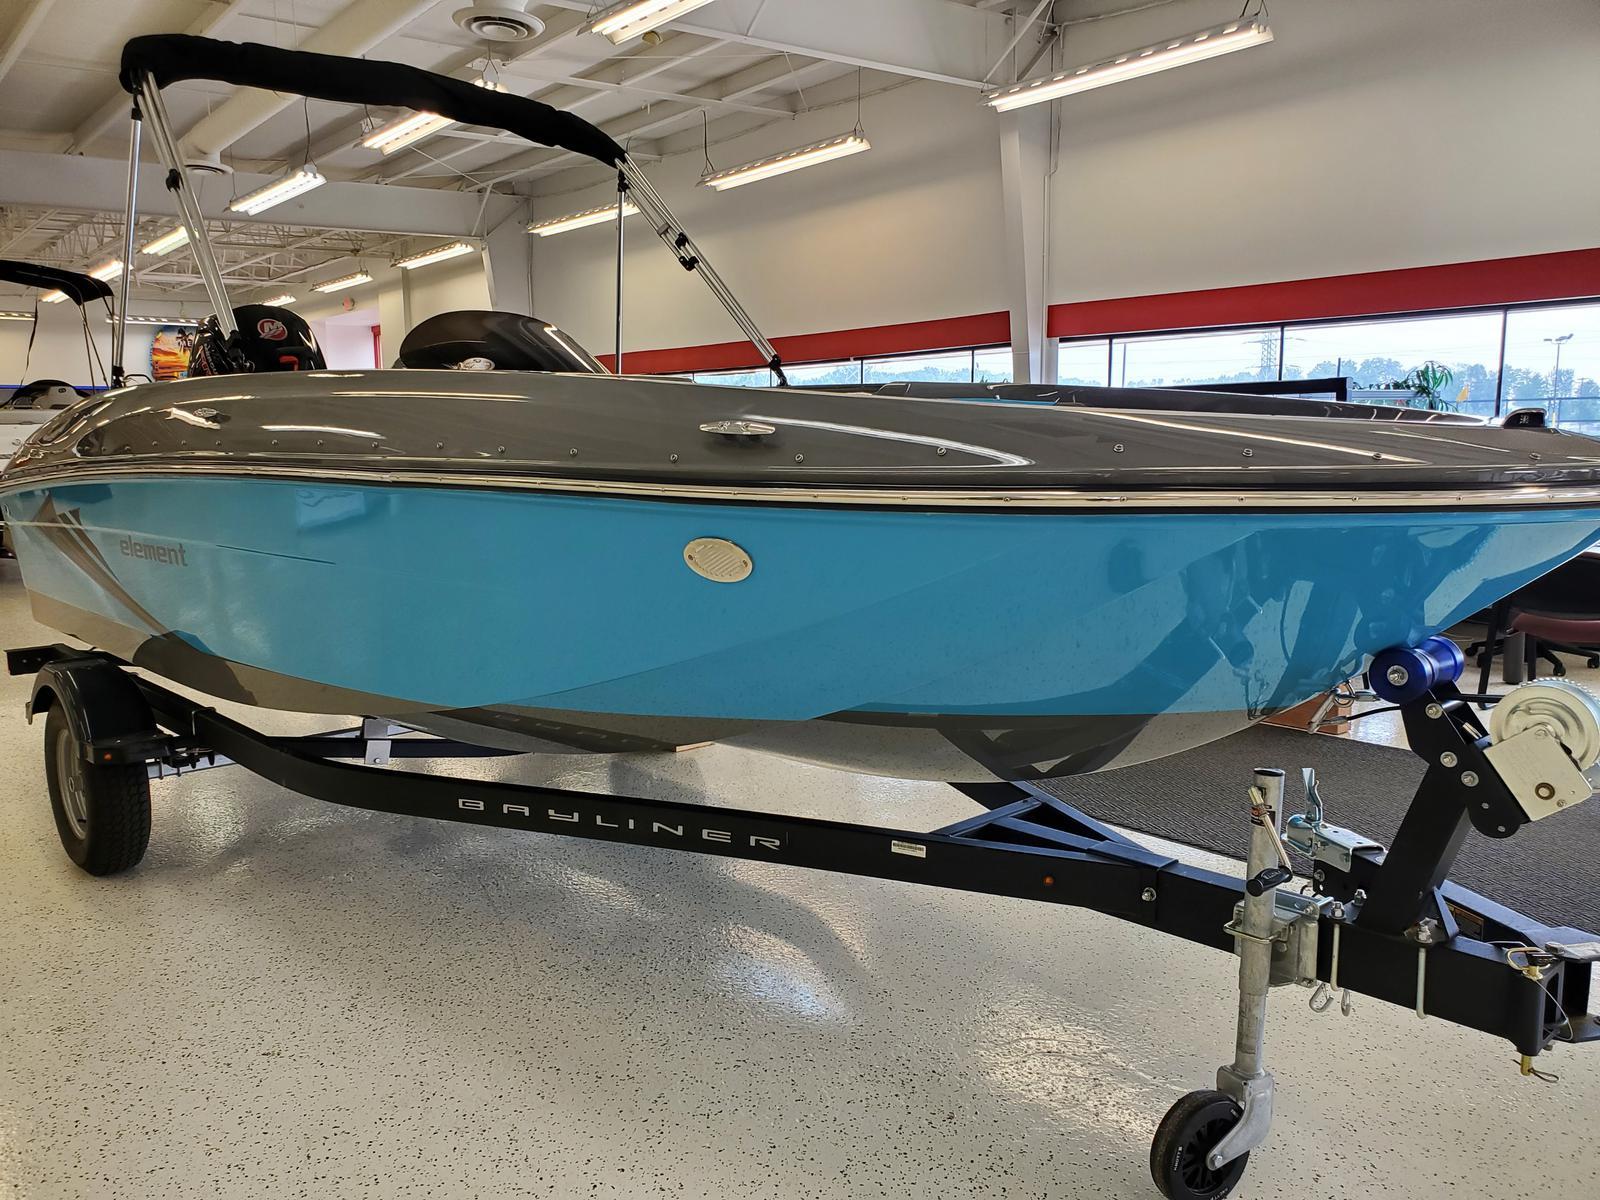 2021 Bayliner boat for sale, model of the boat is Element E18 & Image # 1 of 7